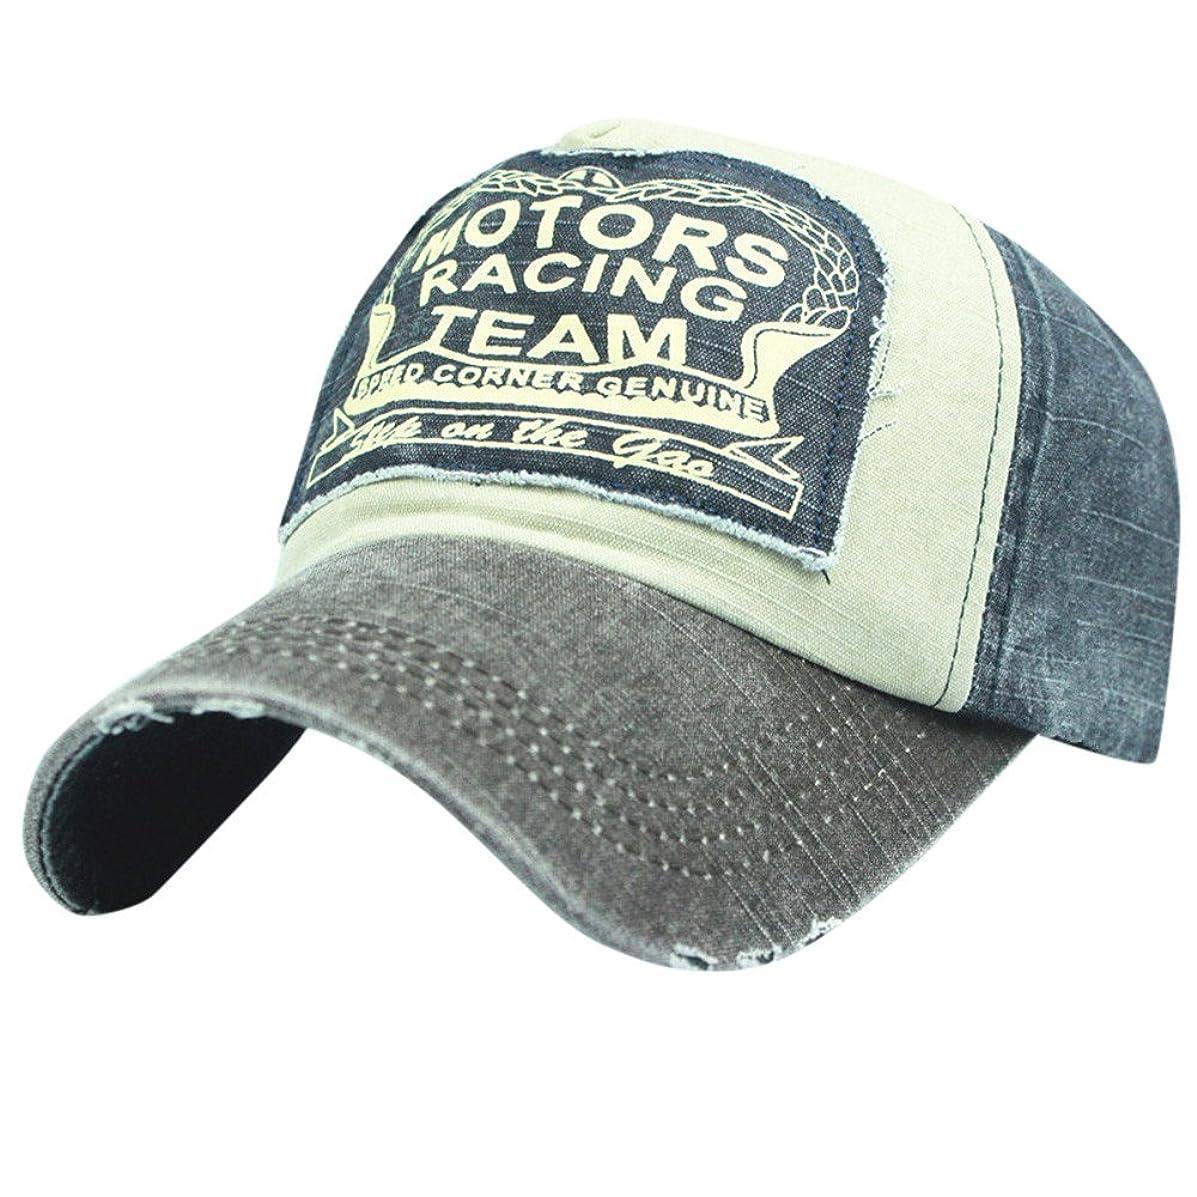 Baseball Cap, Koolsants Fashion Embroidery Motors Racing TEAN Style Washed Adjustable Breathable Cotton Dad Hat Women Men